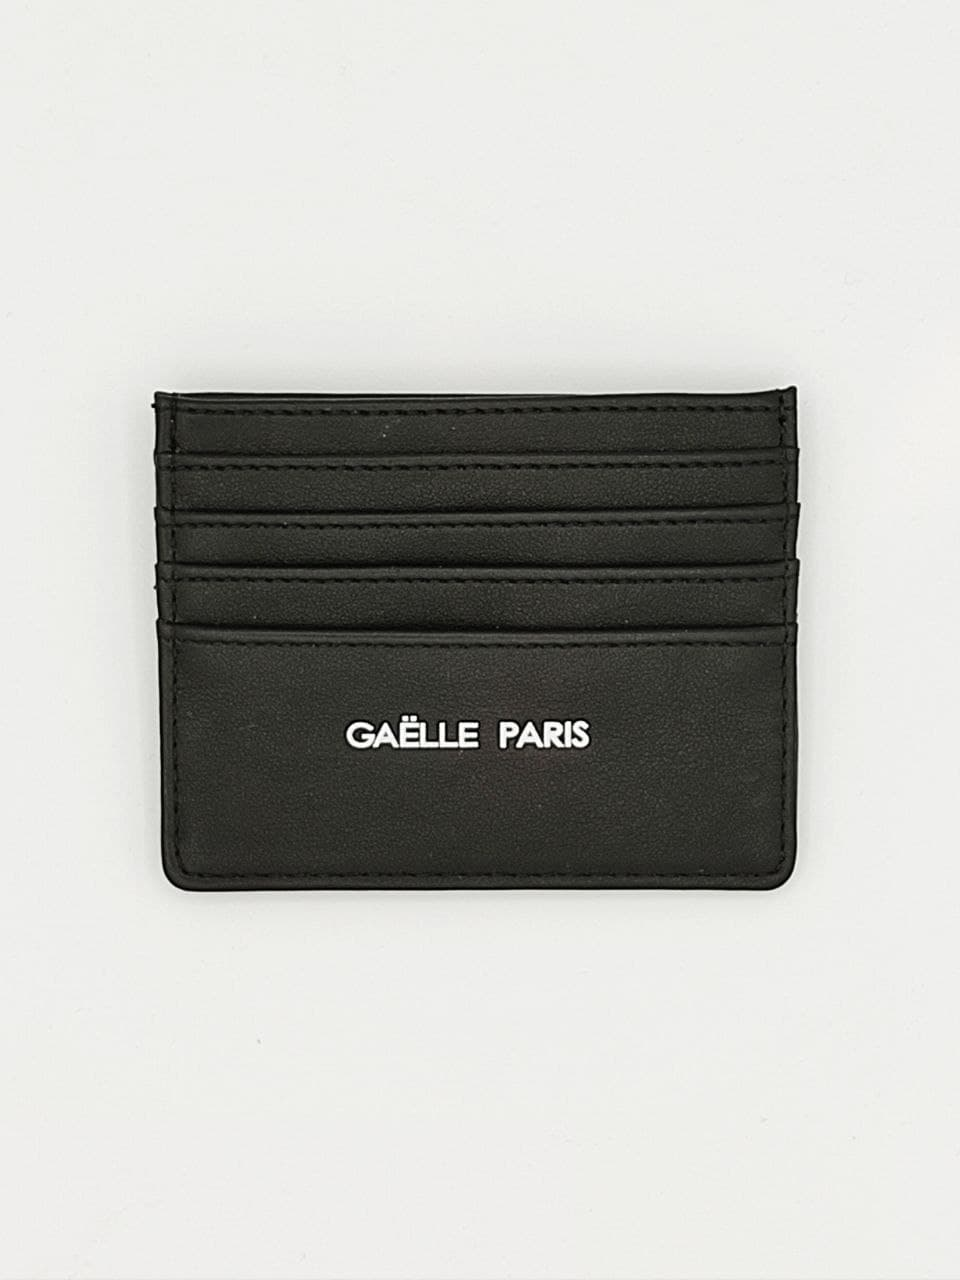 GAELLE PARIS      GBUA600NE